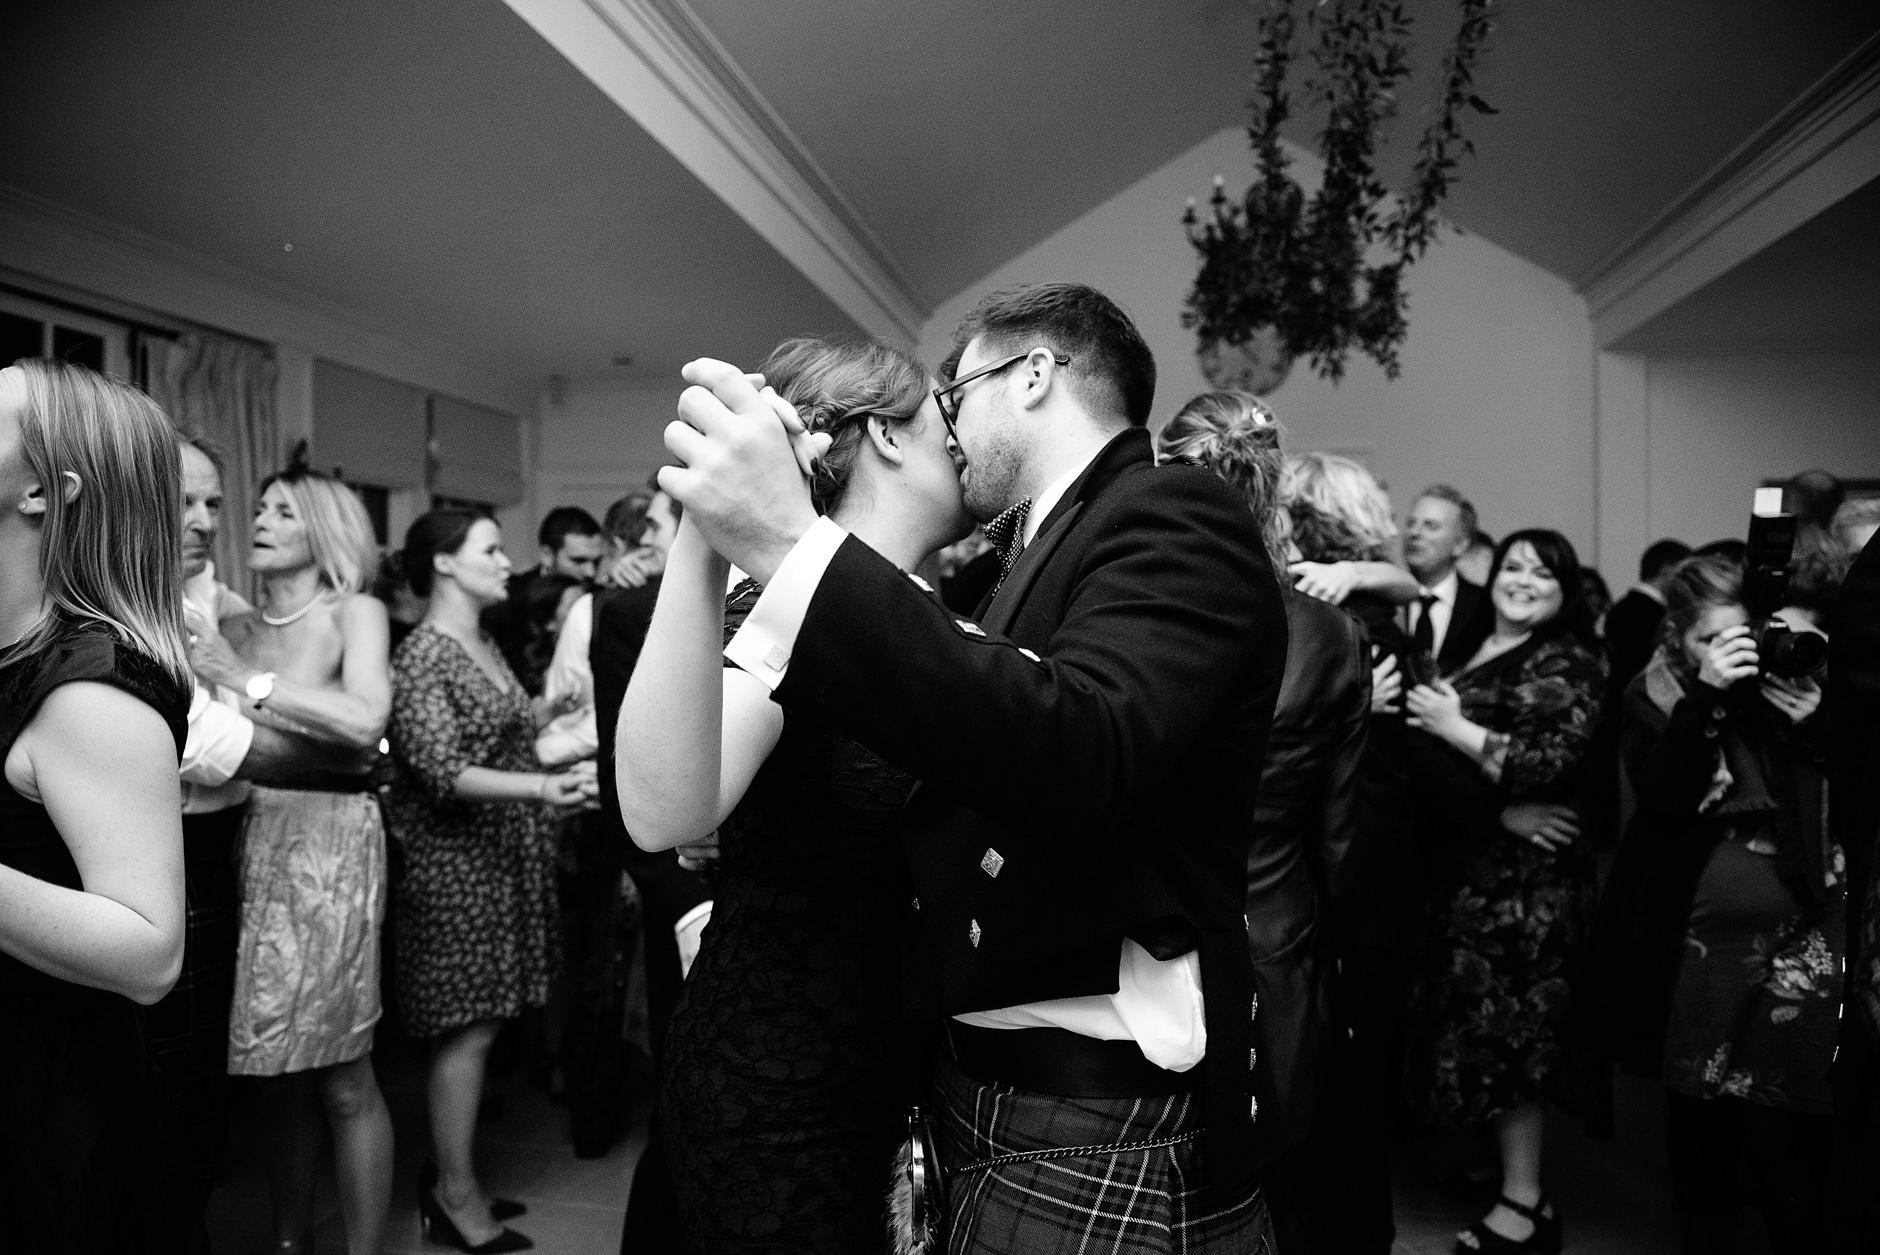 Glentruim-Wedding-Nikki-Leadbetter-Photography-370.jpg